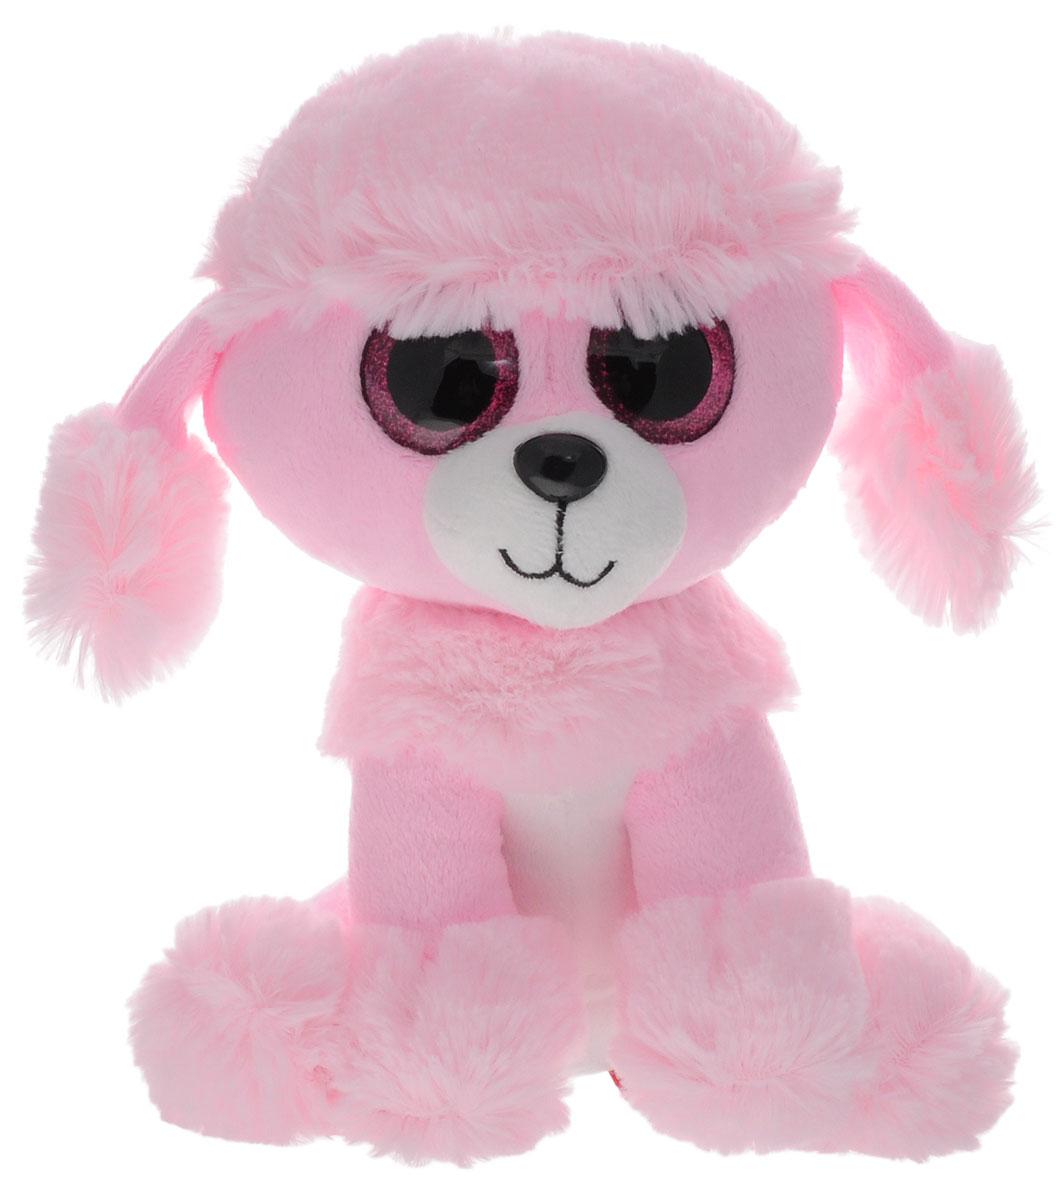 Fancy Мягкая игрушка Пудель Глазастик 22 см fancy мягкая игрушка собака соня 70 см